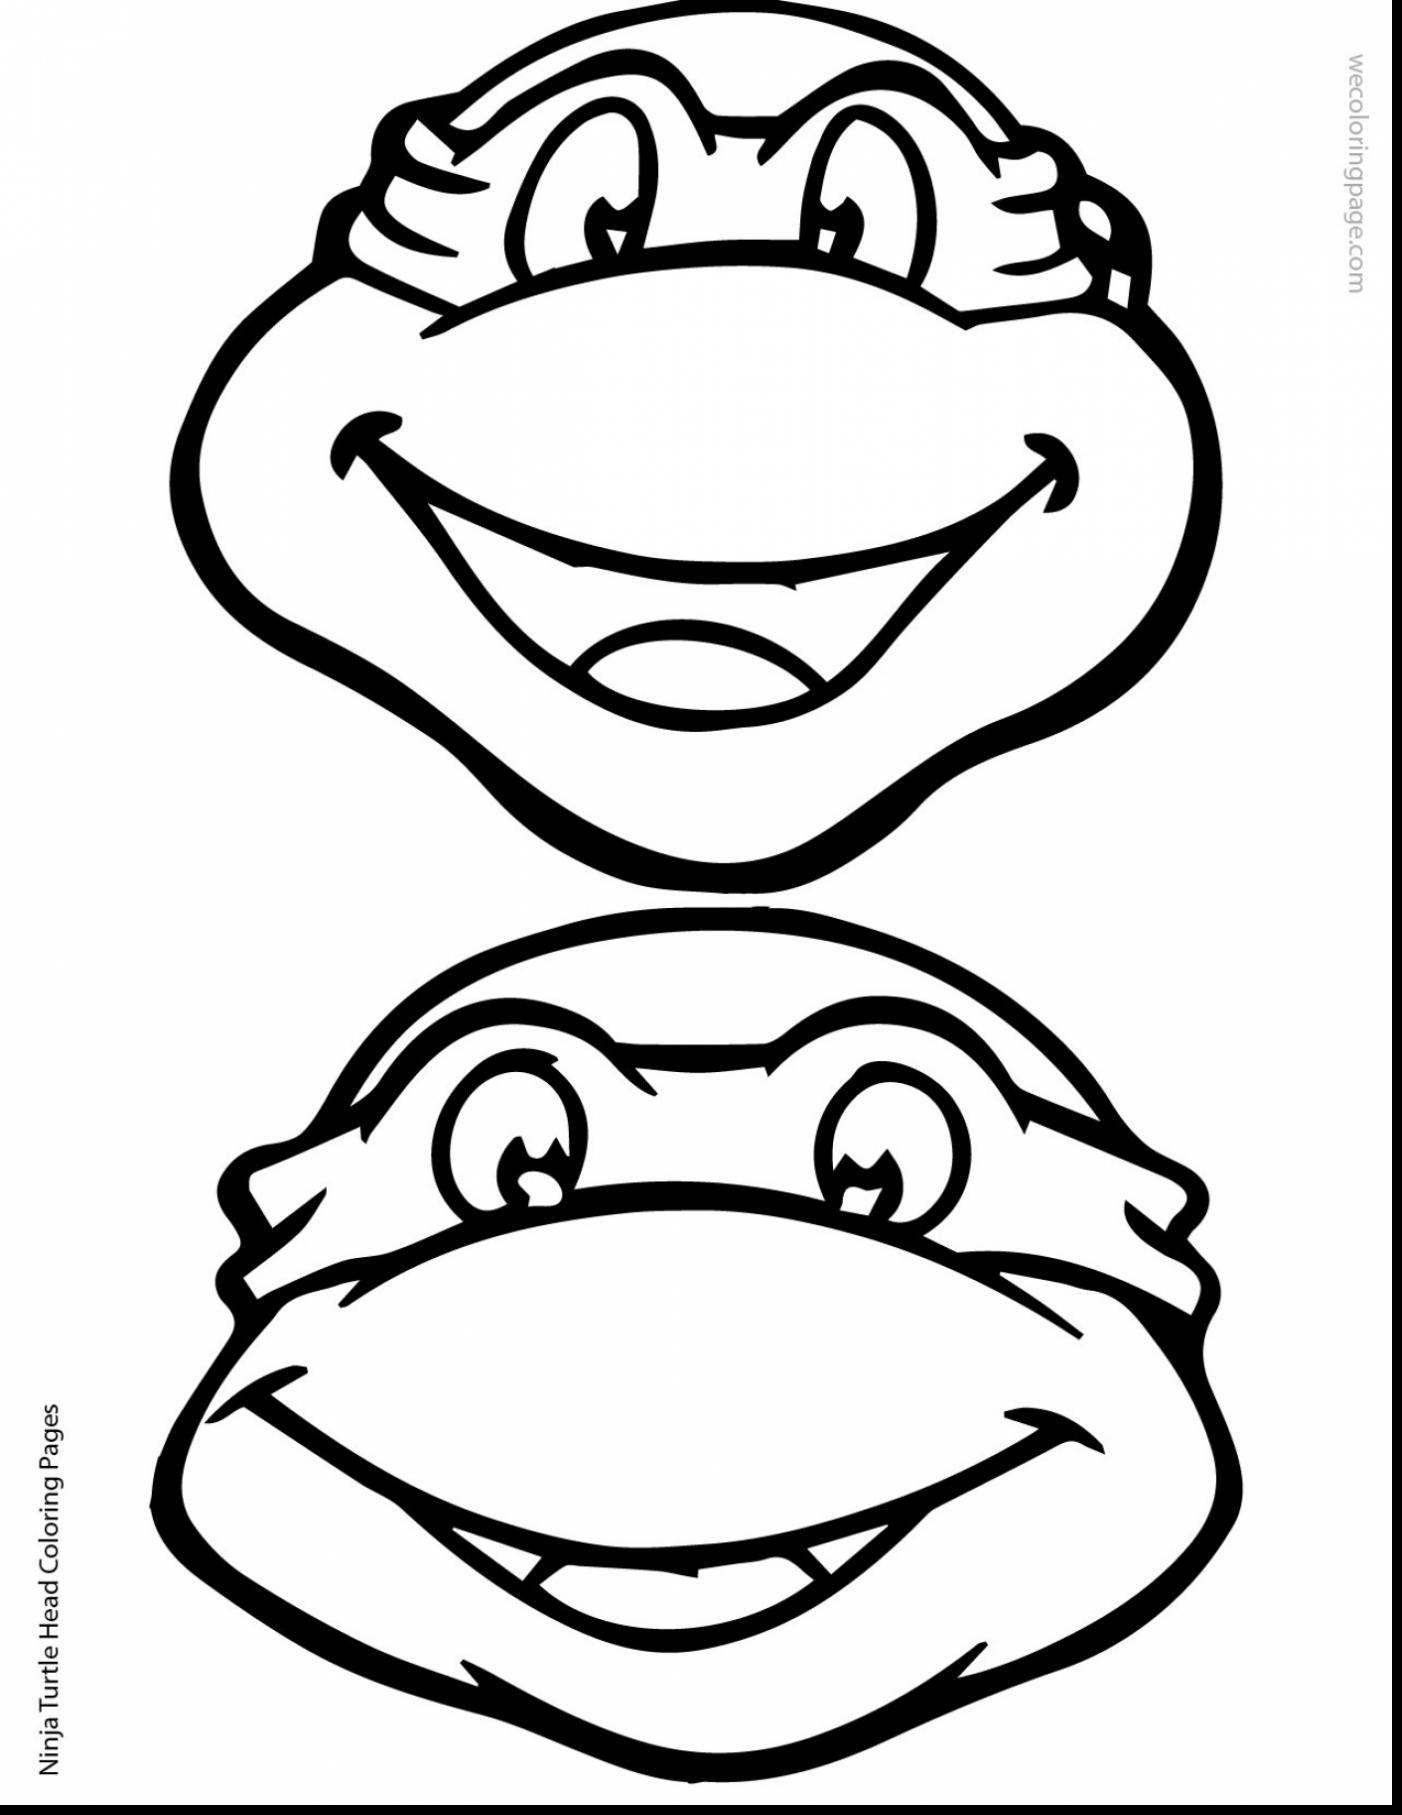 Michelangelo Ninja Turtle Coloring Page Youngandtae Com Ninja Turtle Coloring Pages Turtle Coloring Pages Ninja Turtle Mask